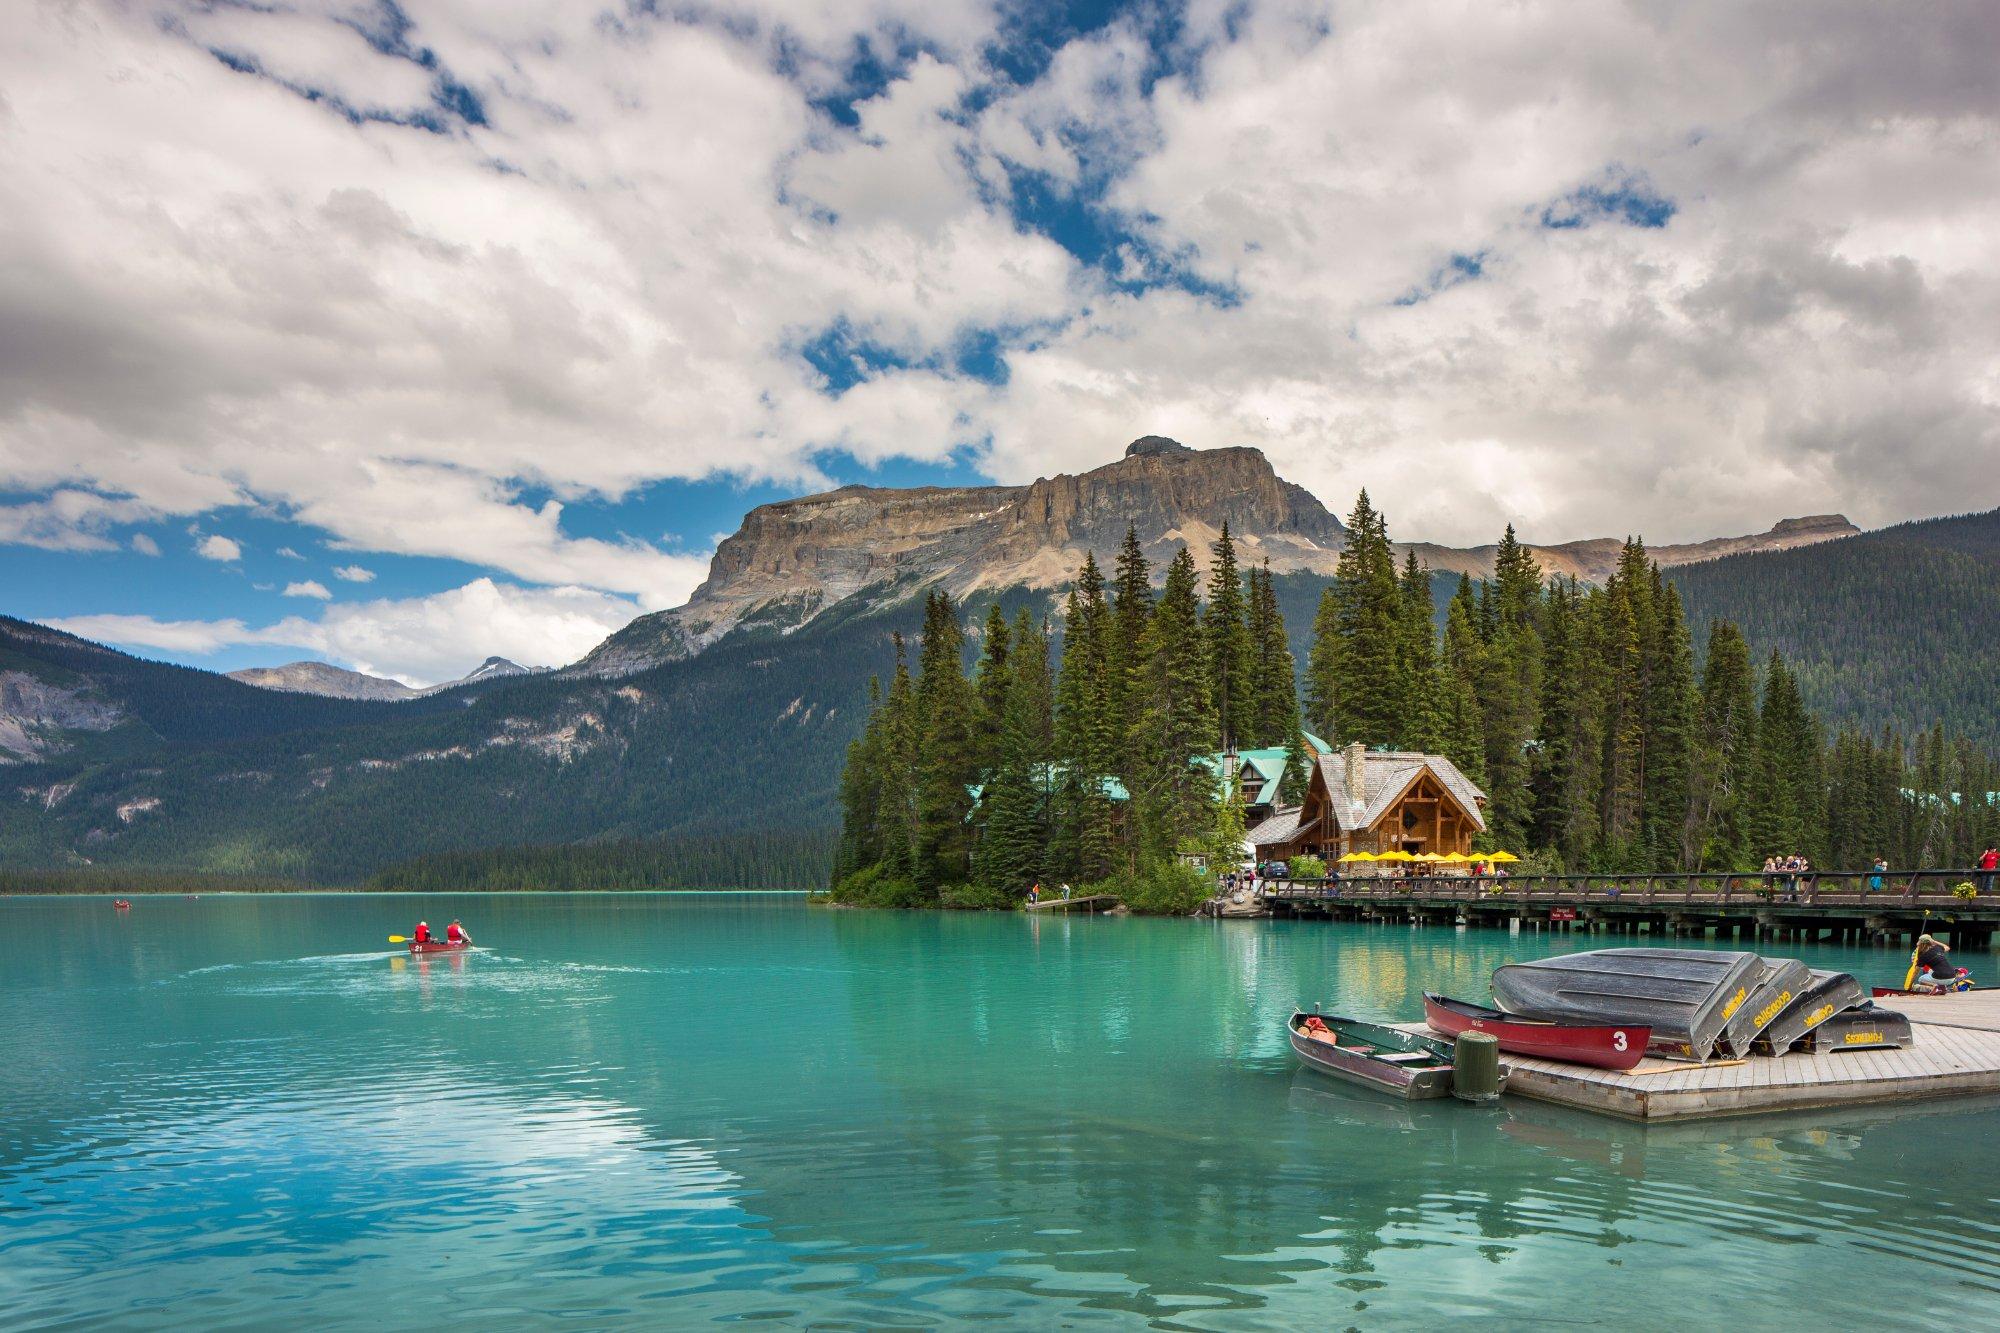 Emerald Lake Lodge Updated 2017 Prices Amp Reviews Field British Columbia Tripadvisor